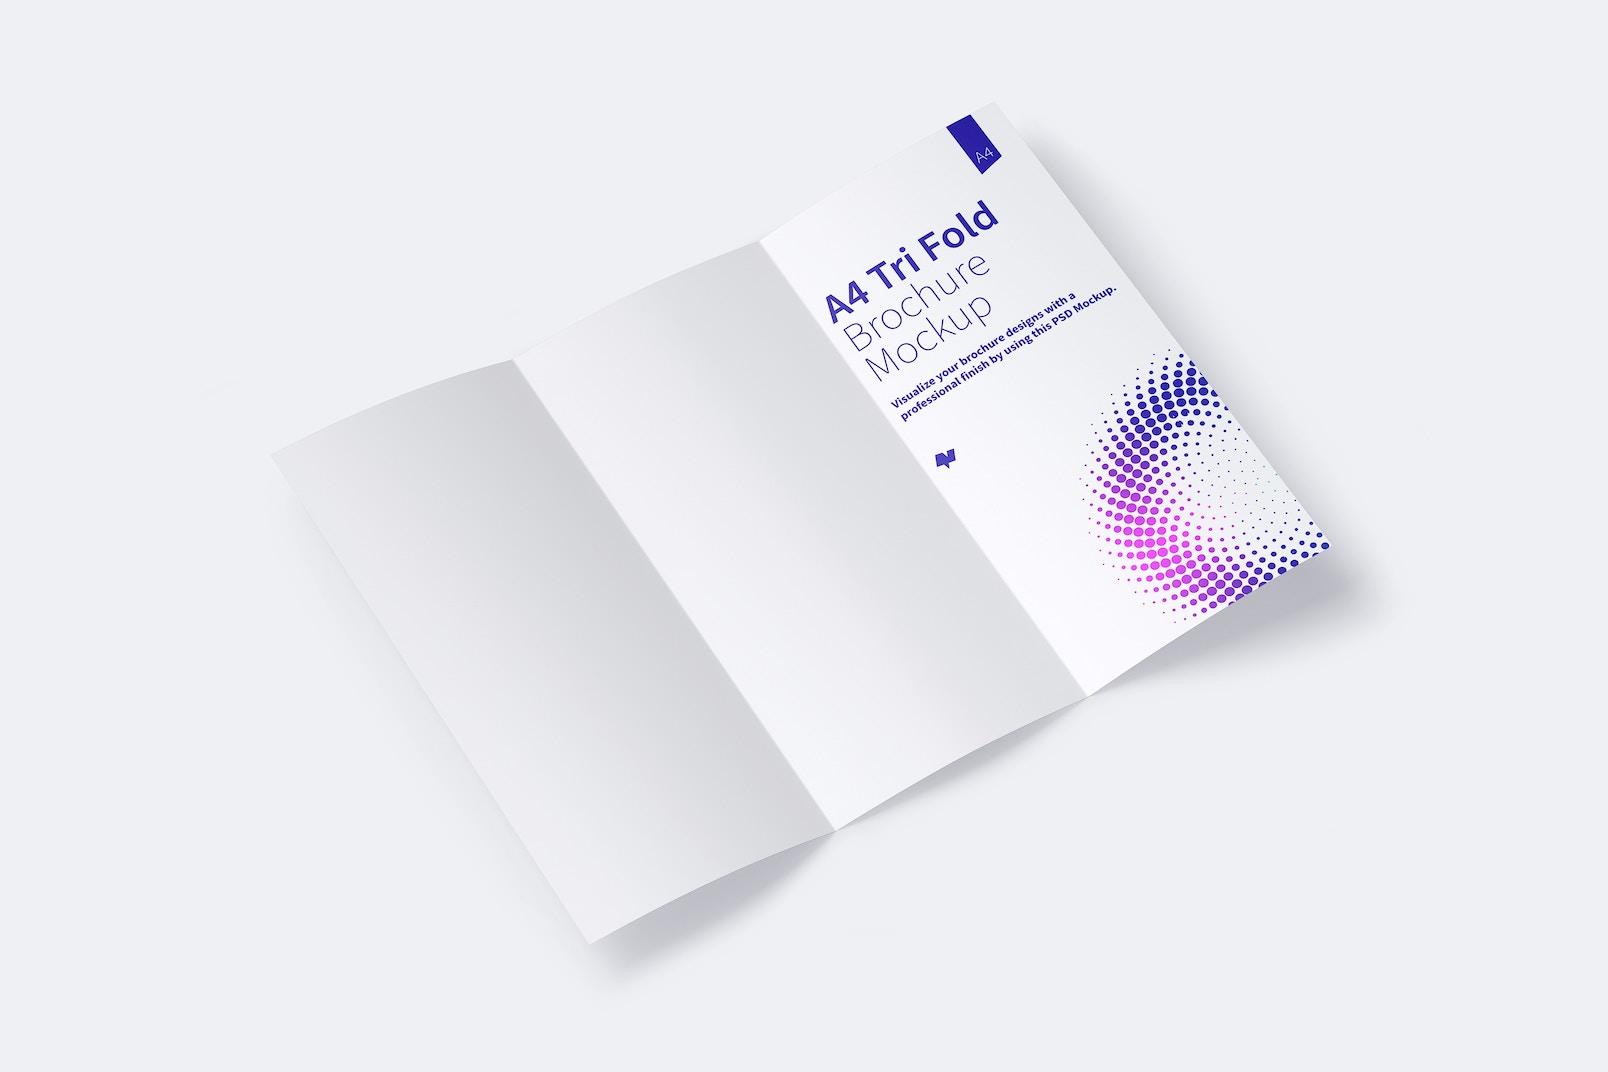 A4 Trifold Brochure Mockup 01